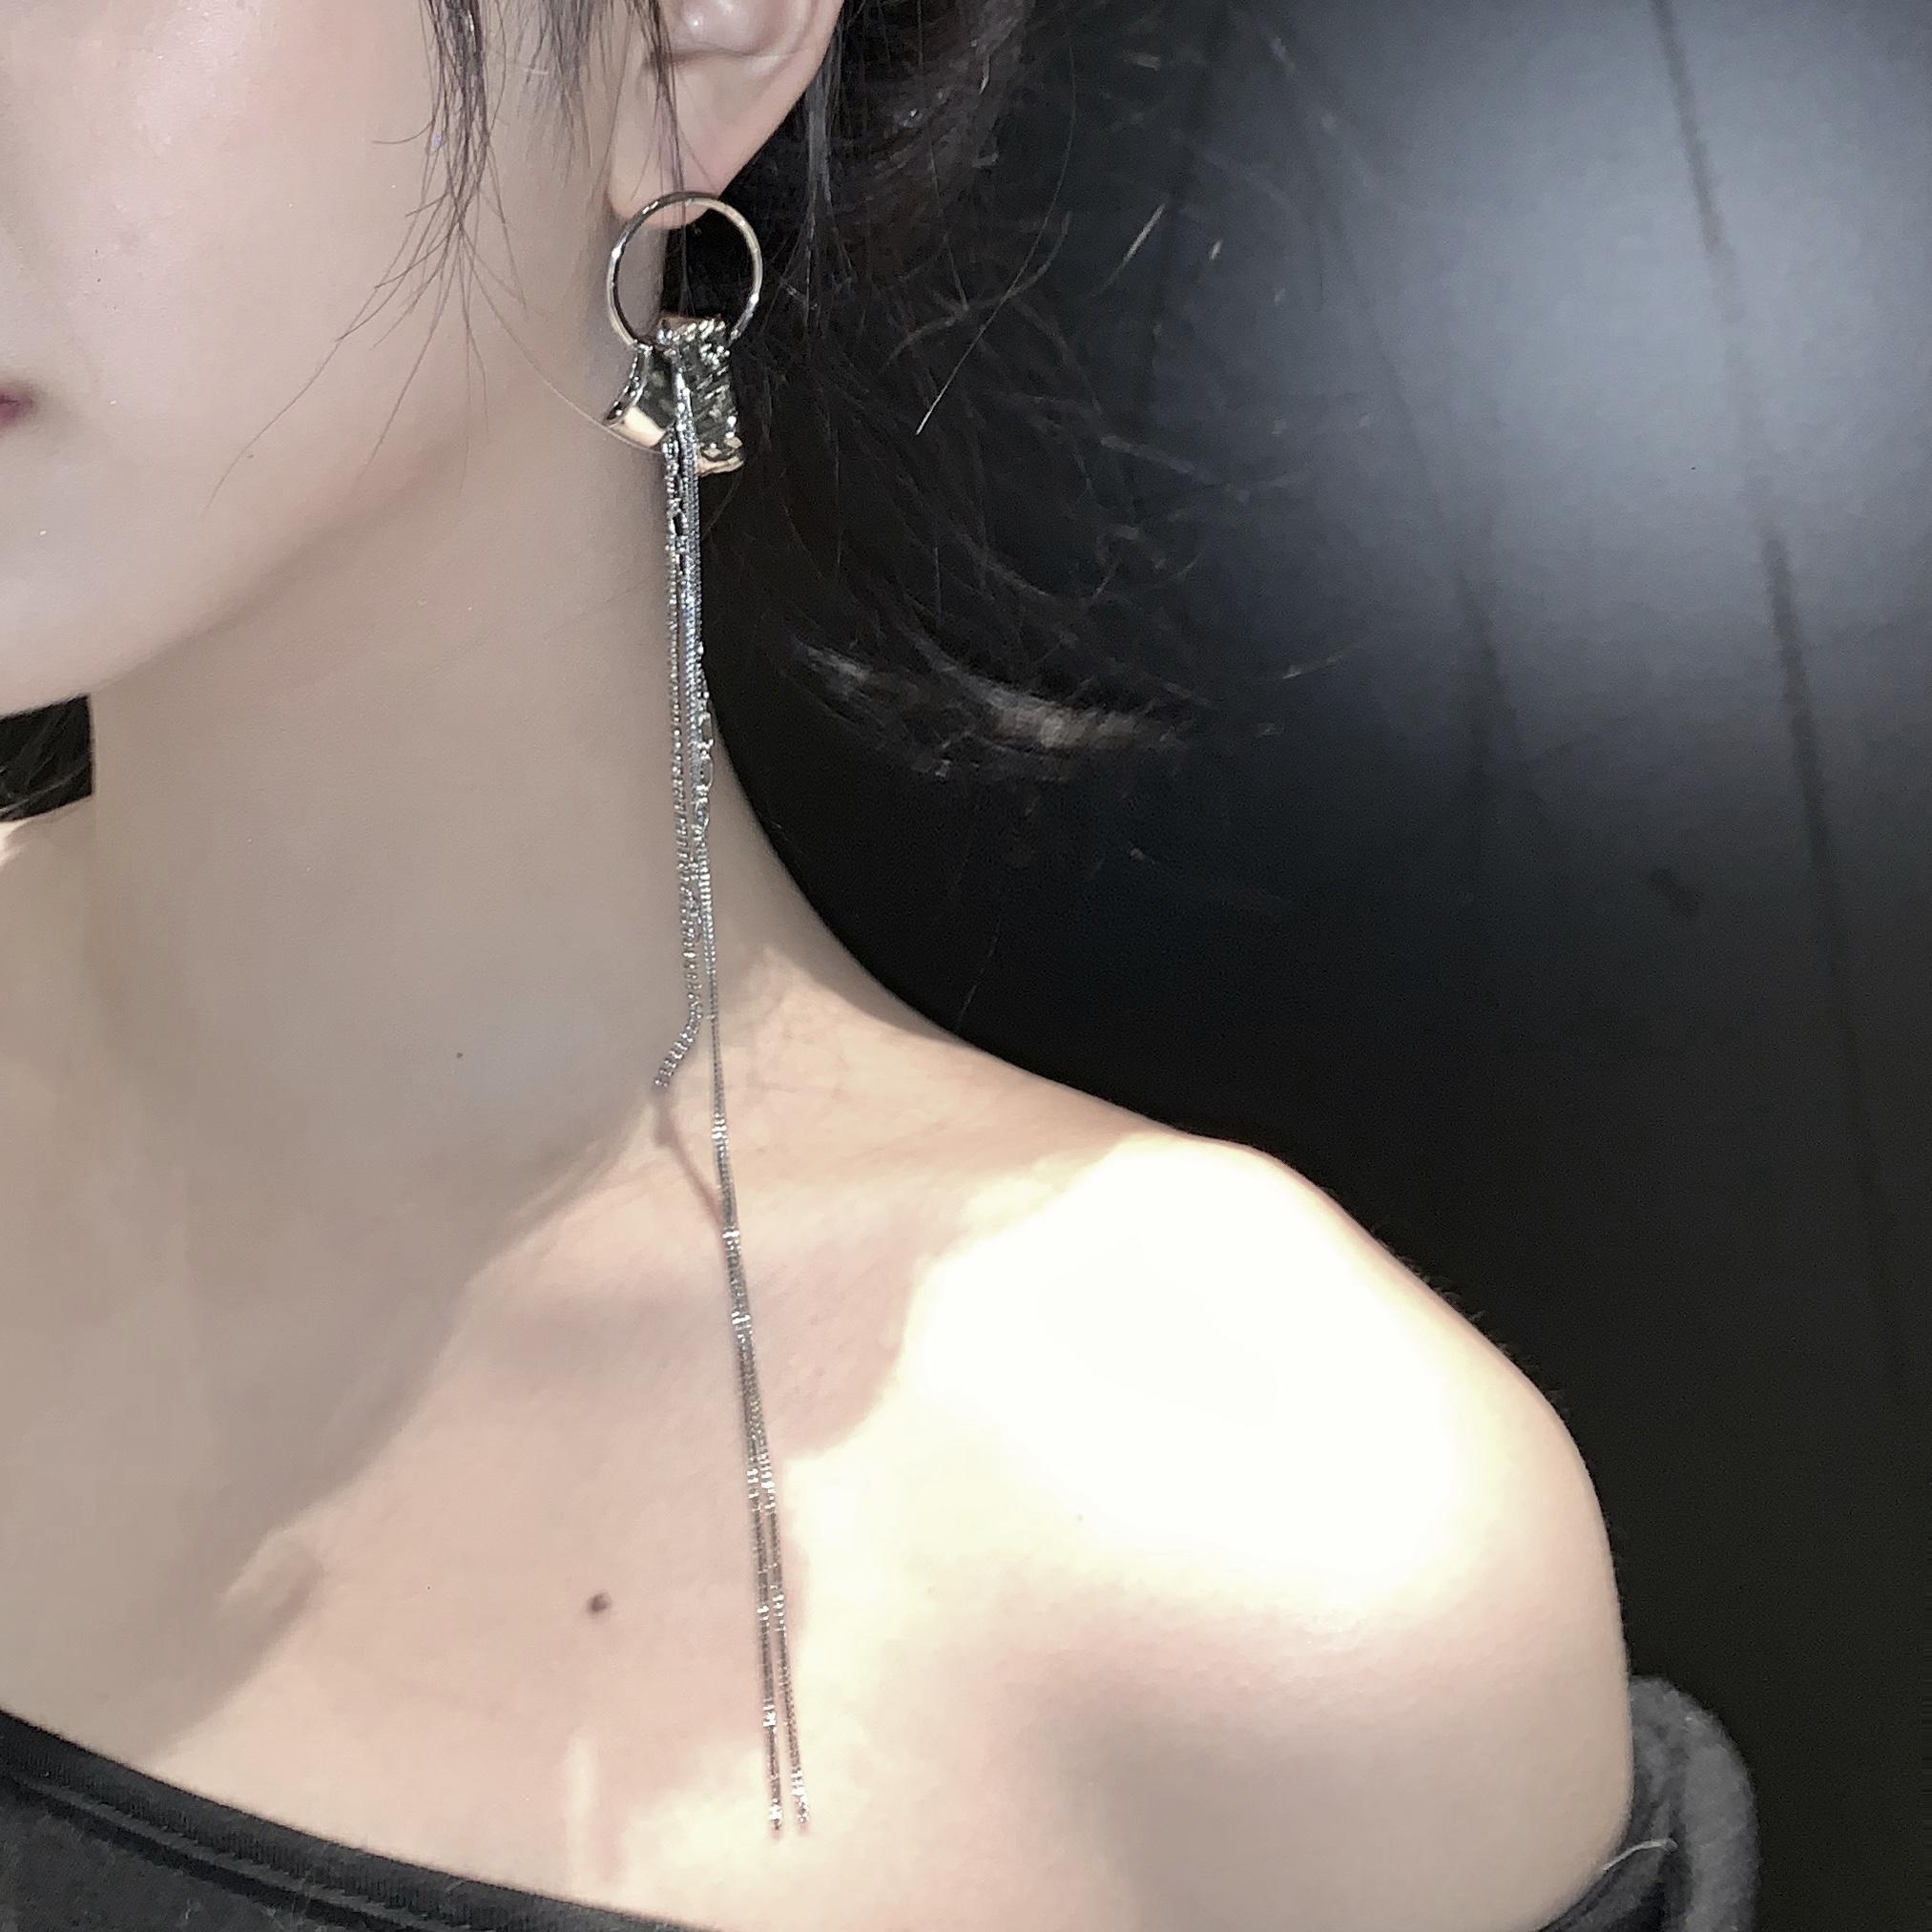 【scandium】很长的单只金属流苏耳环ins简约丝丝同款925银针